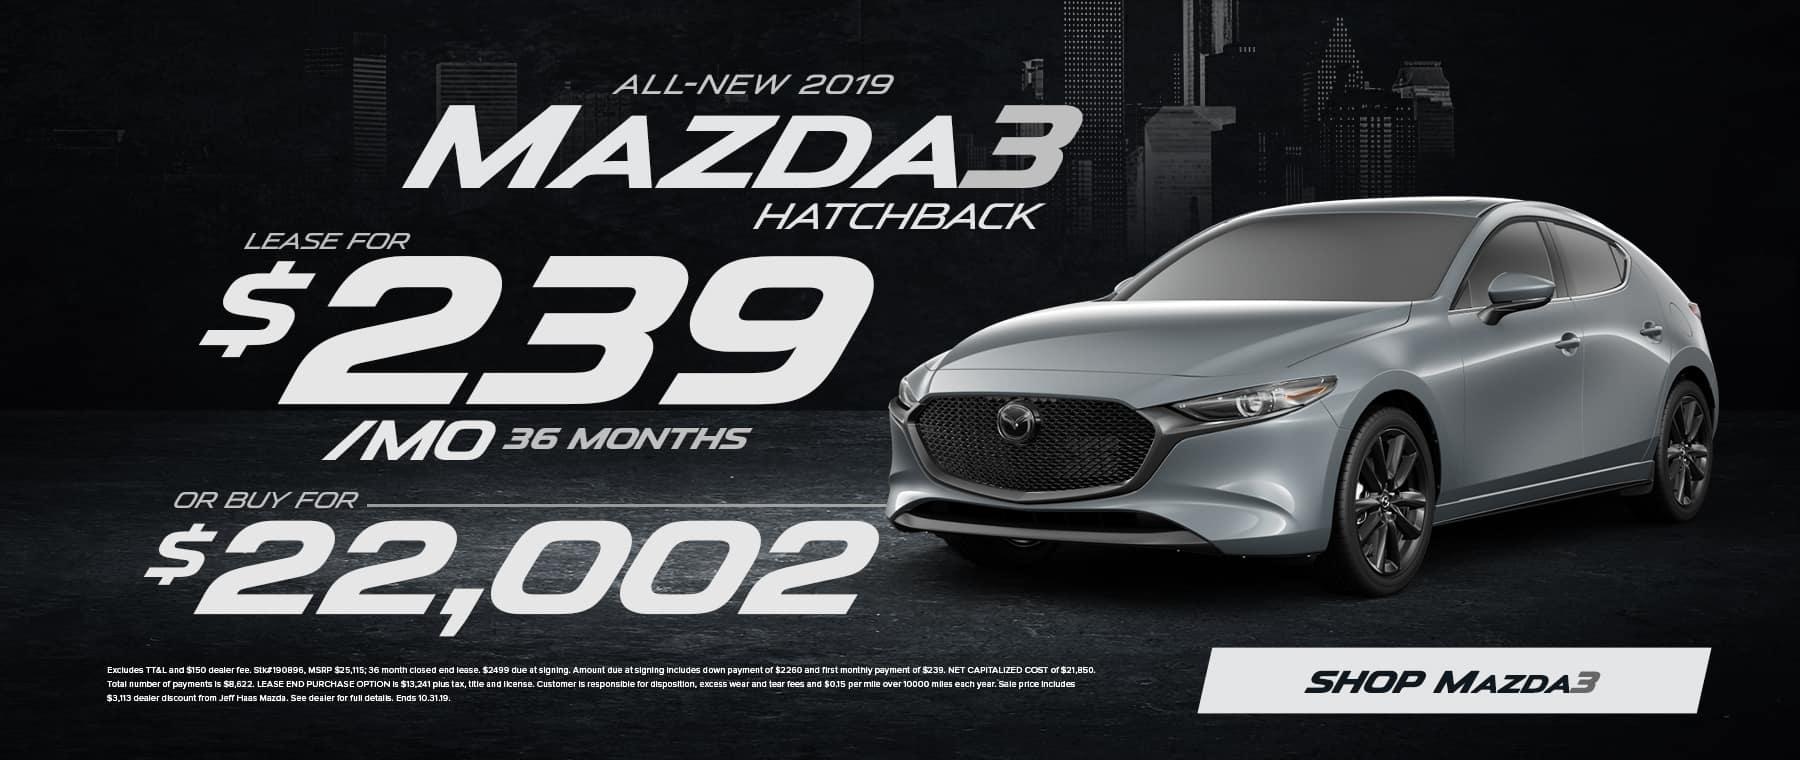 2019 Mazda3 Hatchback Sale in Houston, TX